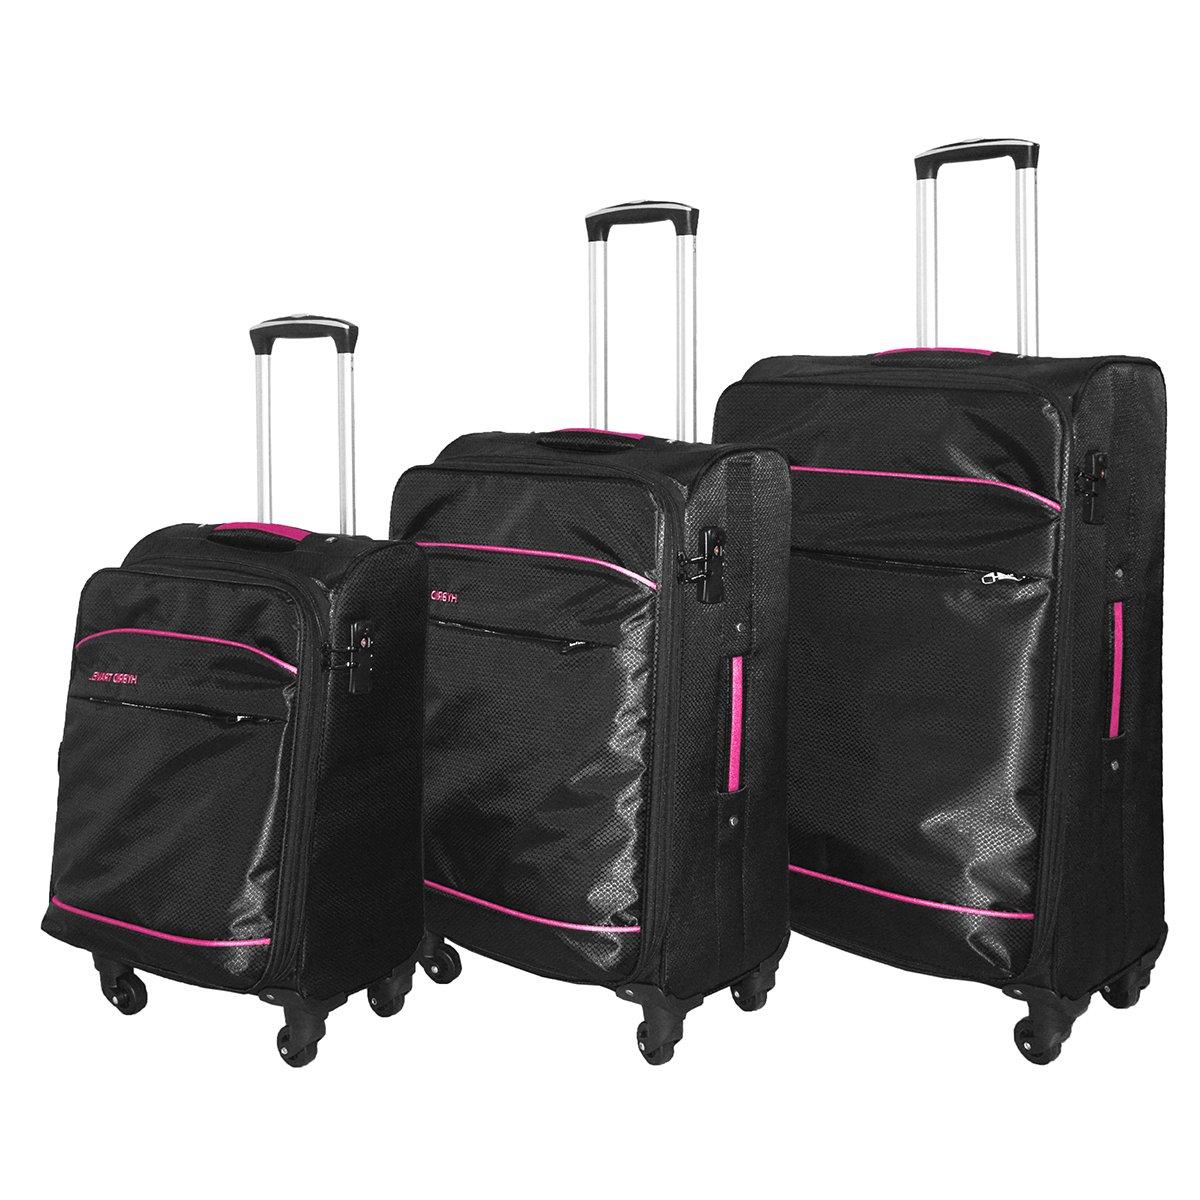 3 PC Luggage Set Durable Lightweight Soft Case Spinner Suitecase LUG3 LK637 BLACK/PINK